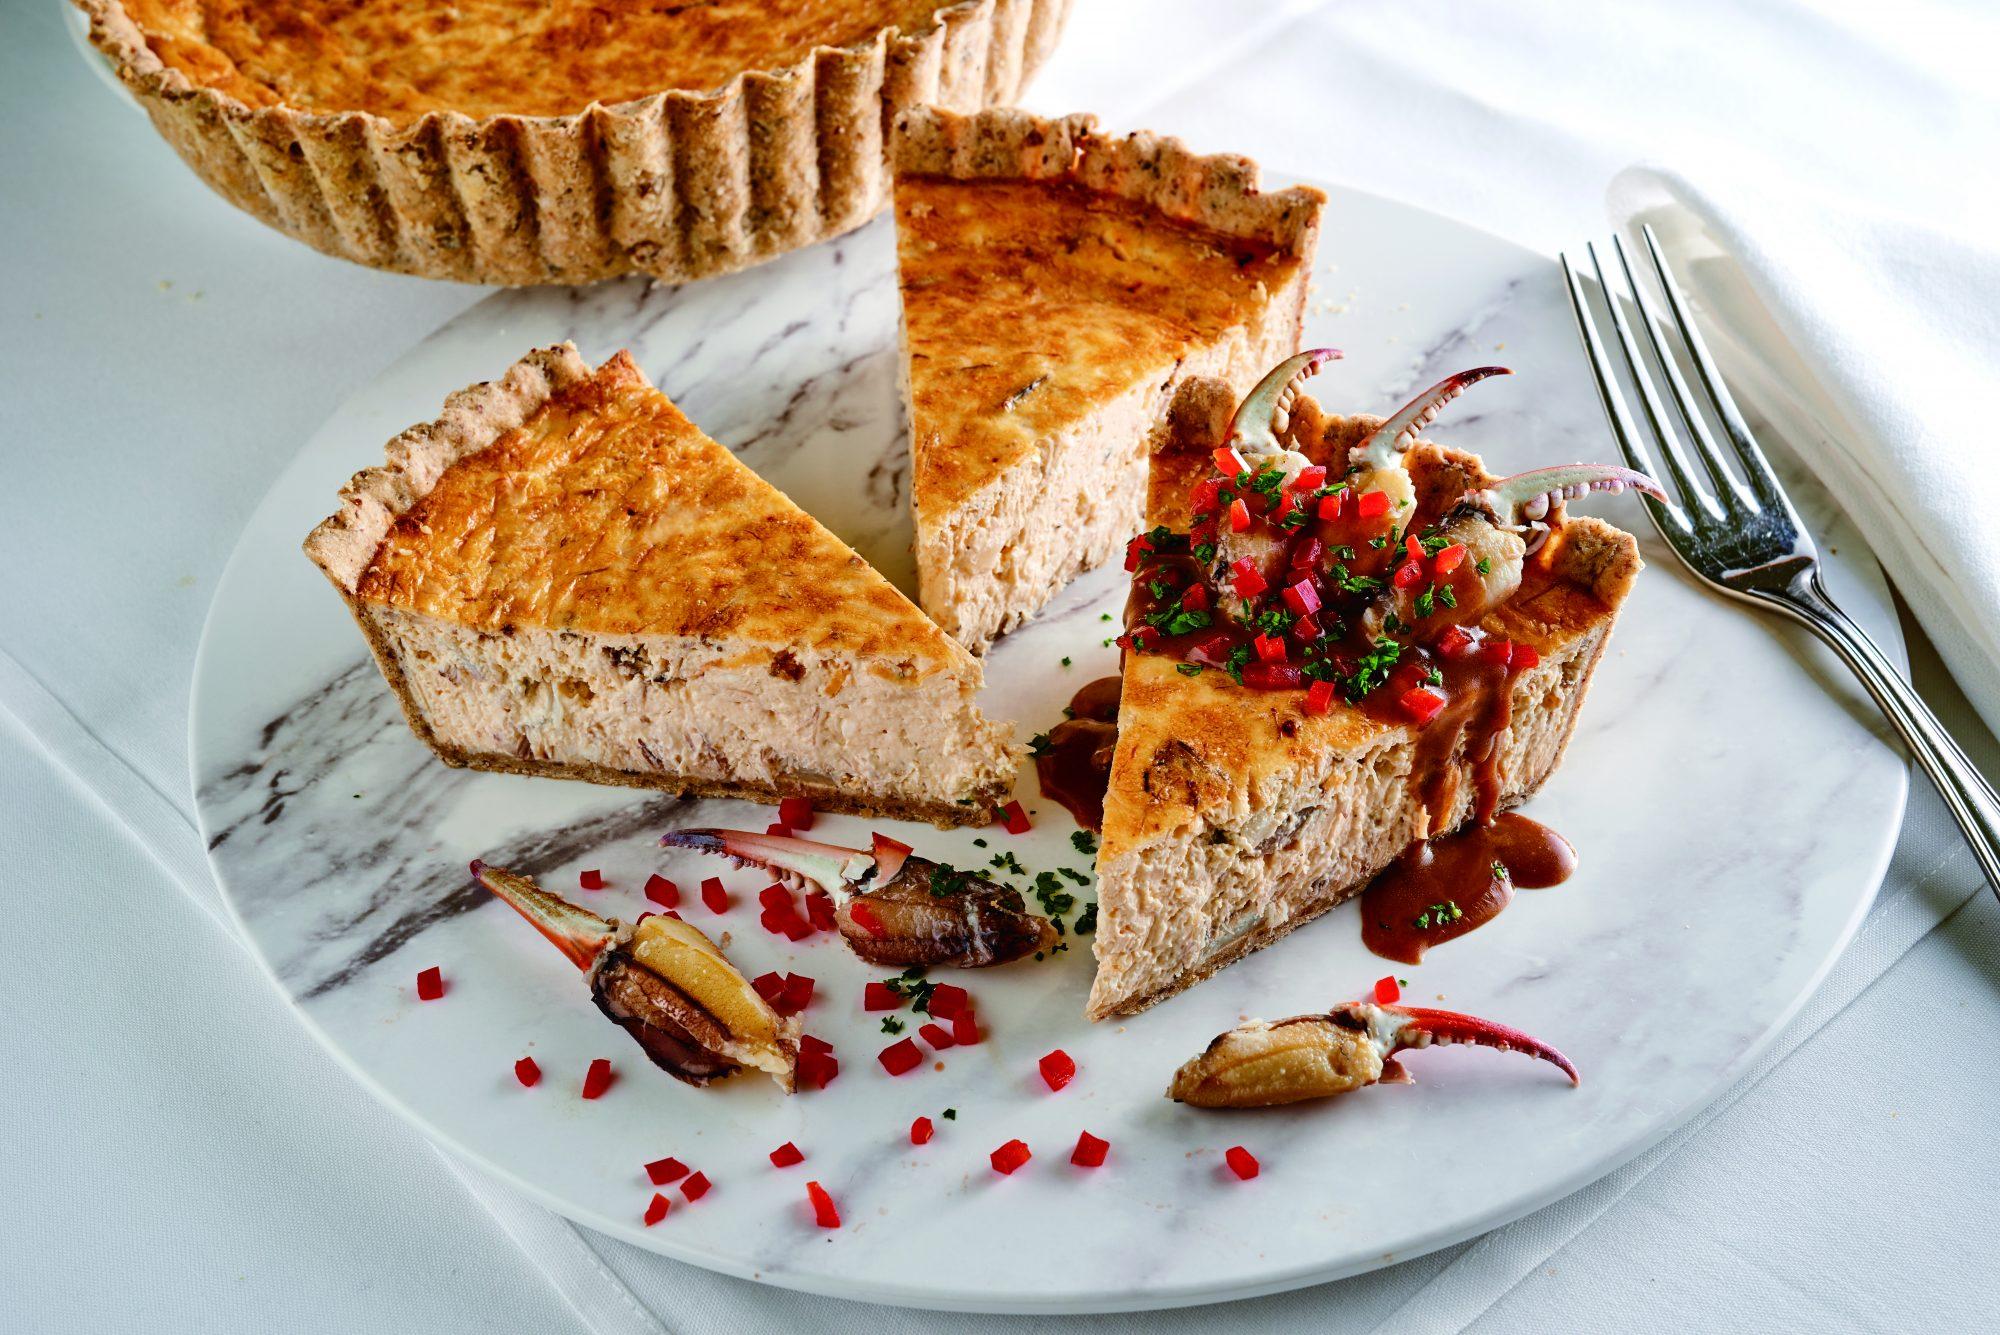 crabmeat-cheesecake-palace-cafe-photo-credit-sam-hanna.jpg